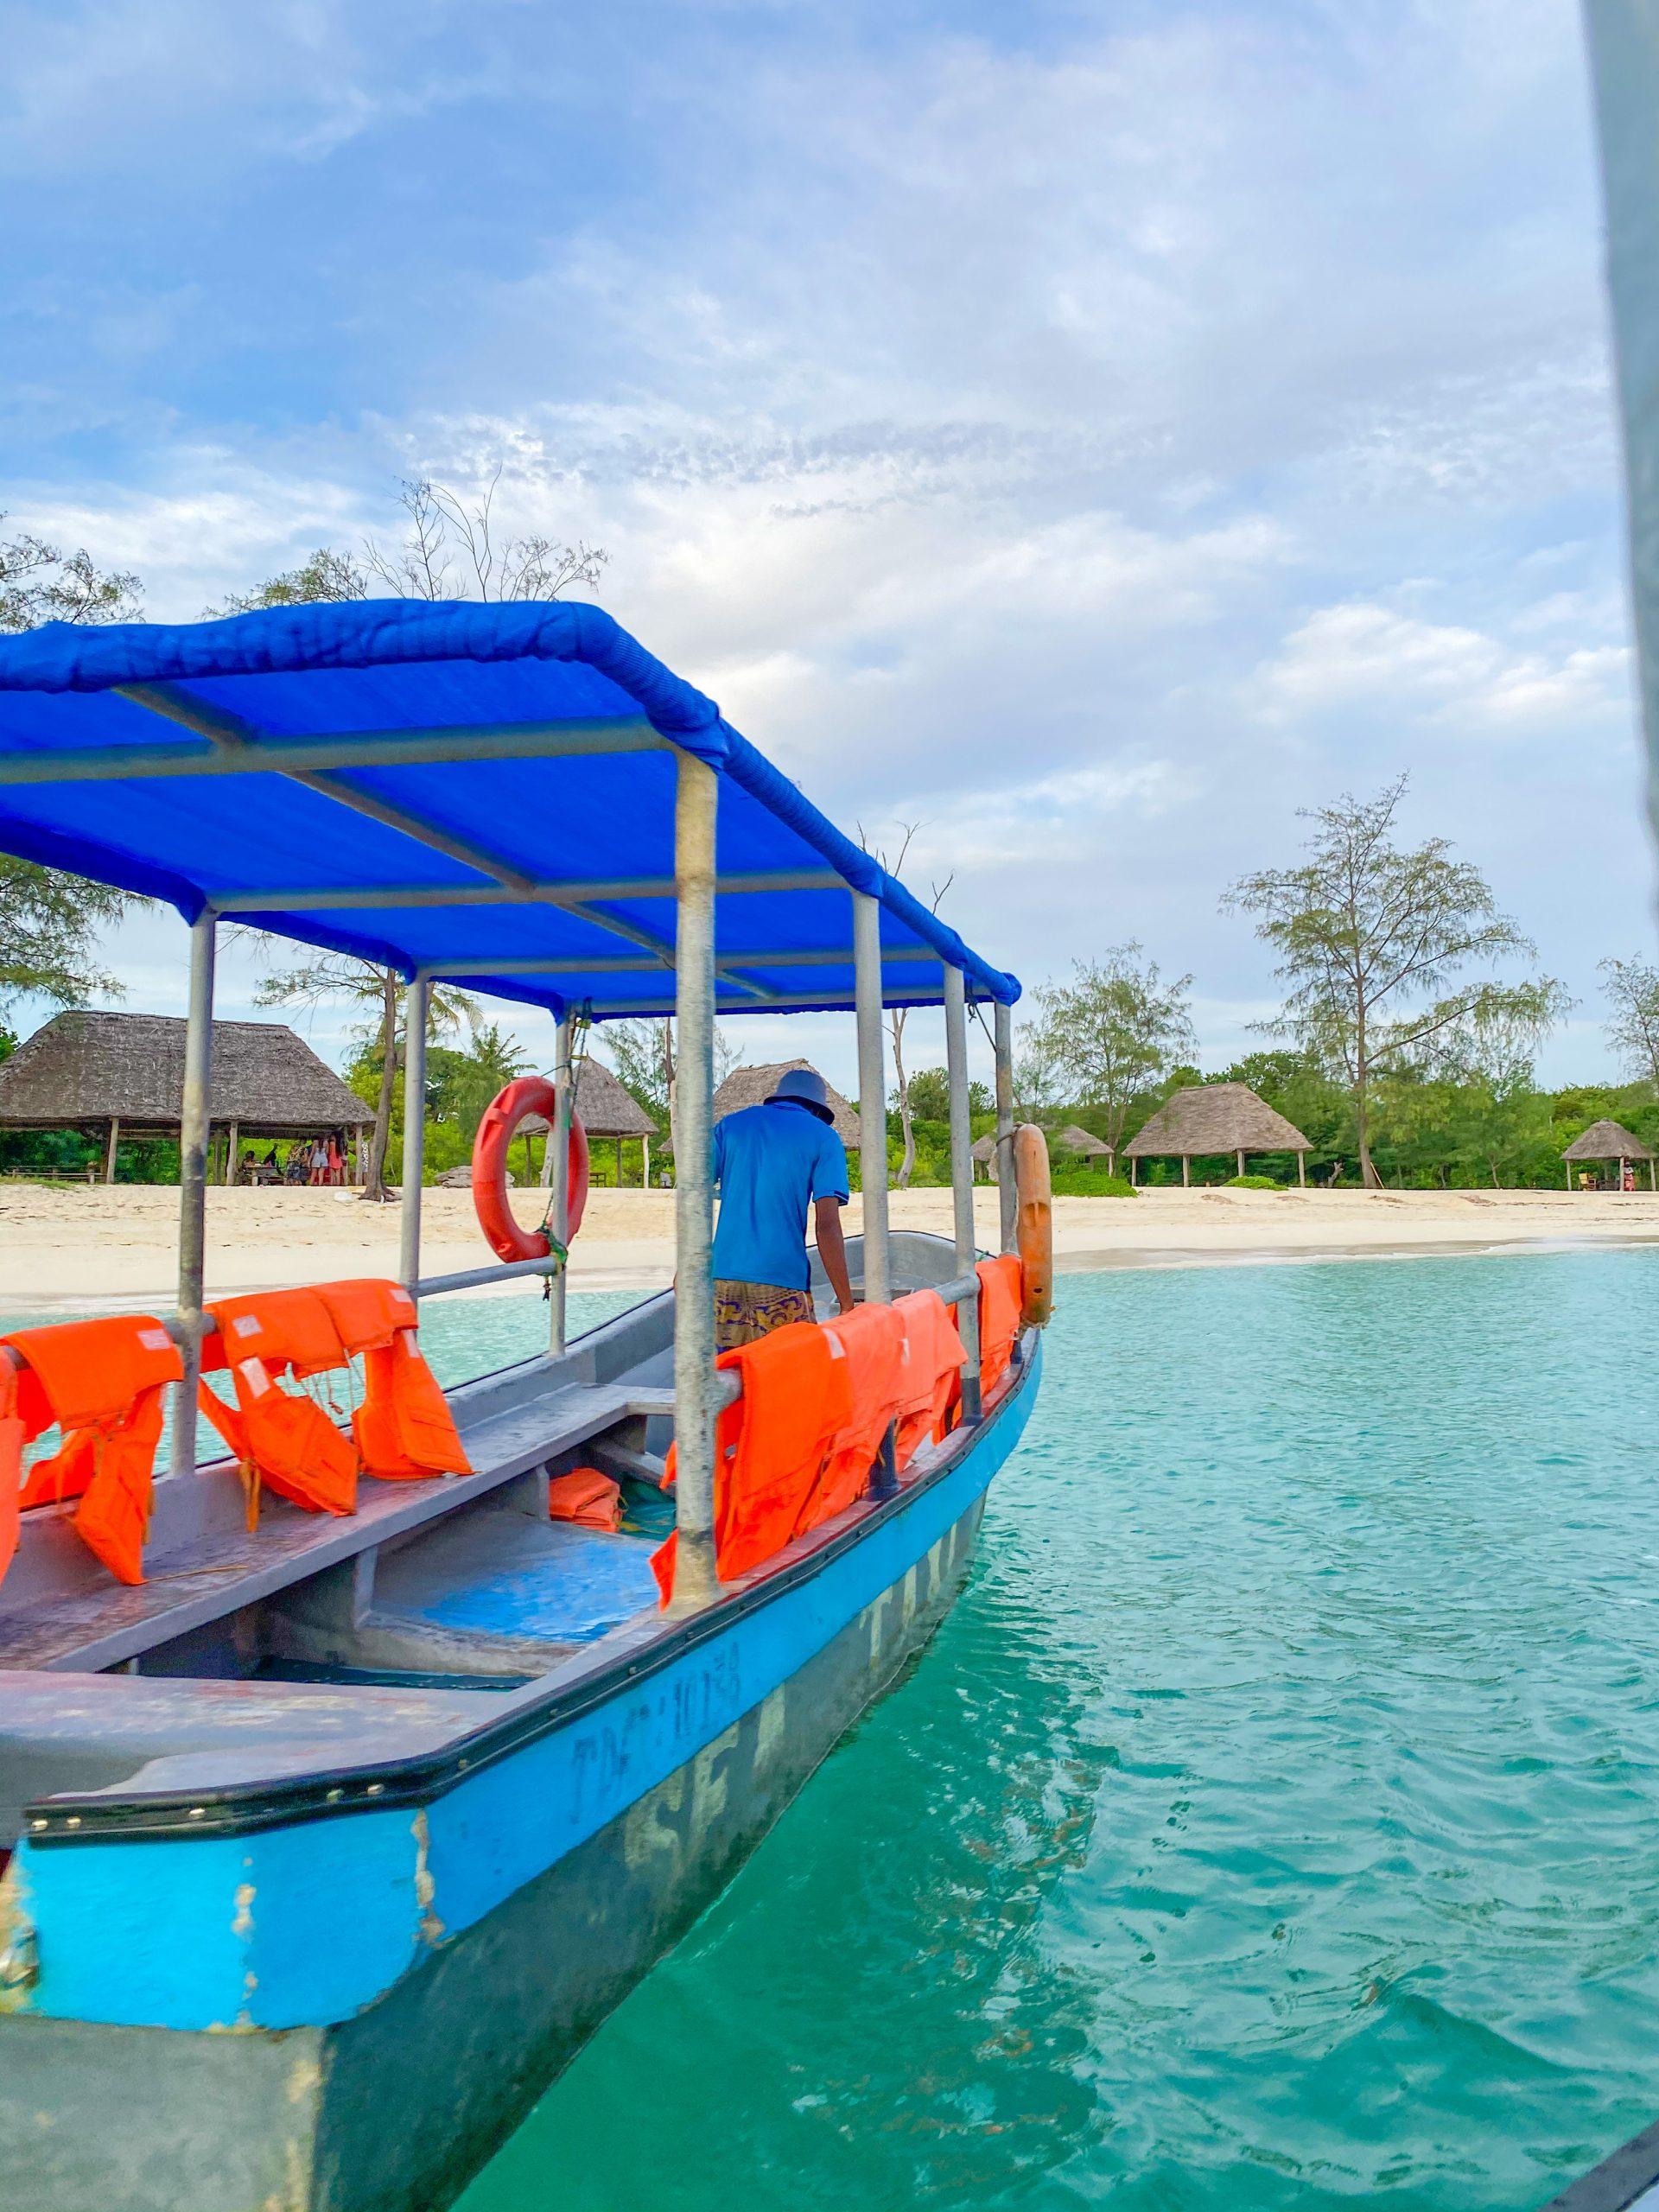 Boat to Mbudya island